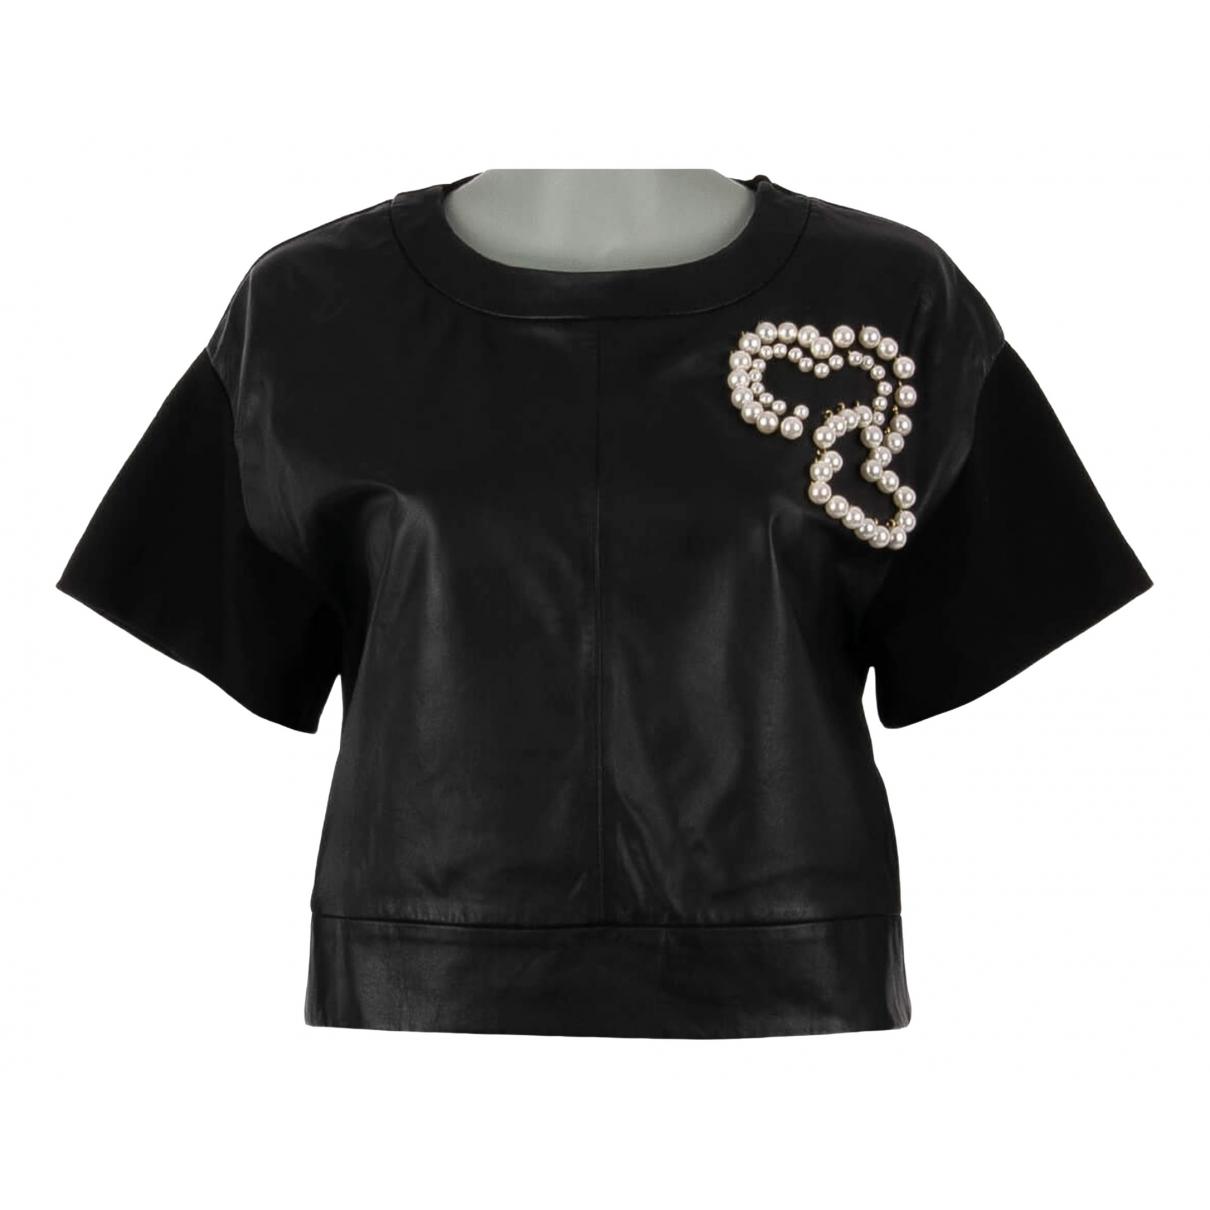 Moschino - Top   pour femme en cuir - noir